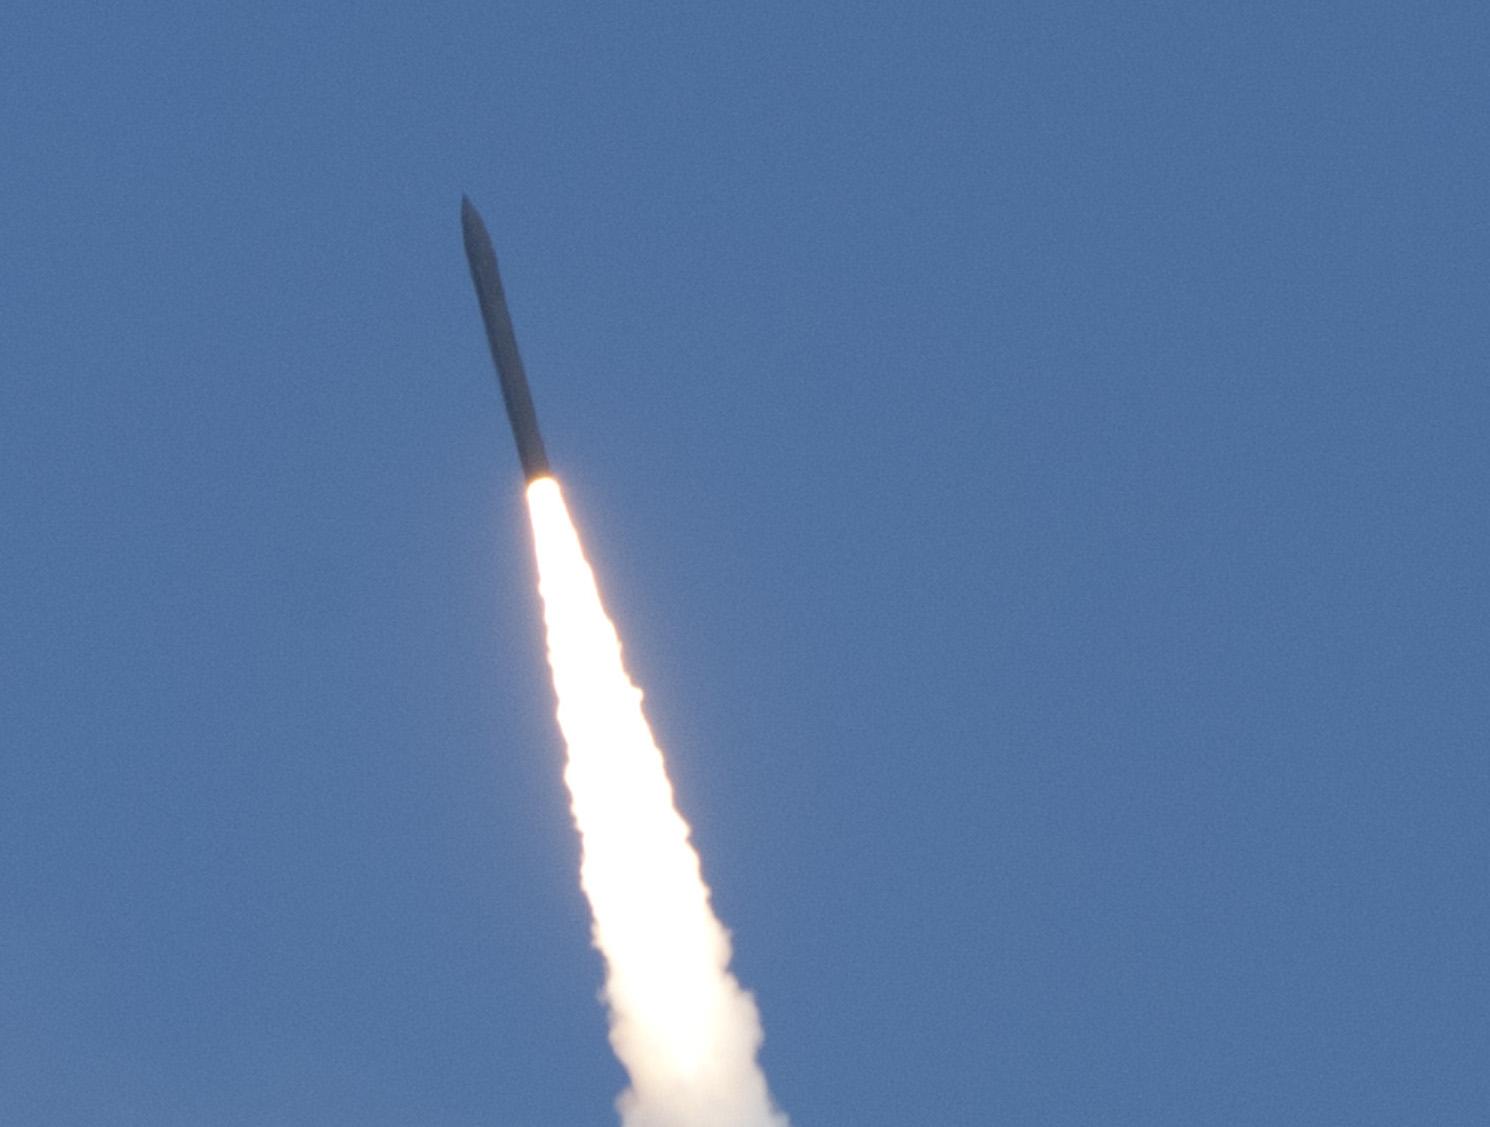 Missile Defense Agency's Flight Test 06b Ground-Based Interceptor launches from Vandenberg Air Force Base, Calif. on June 22, 2014. MDA Photo